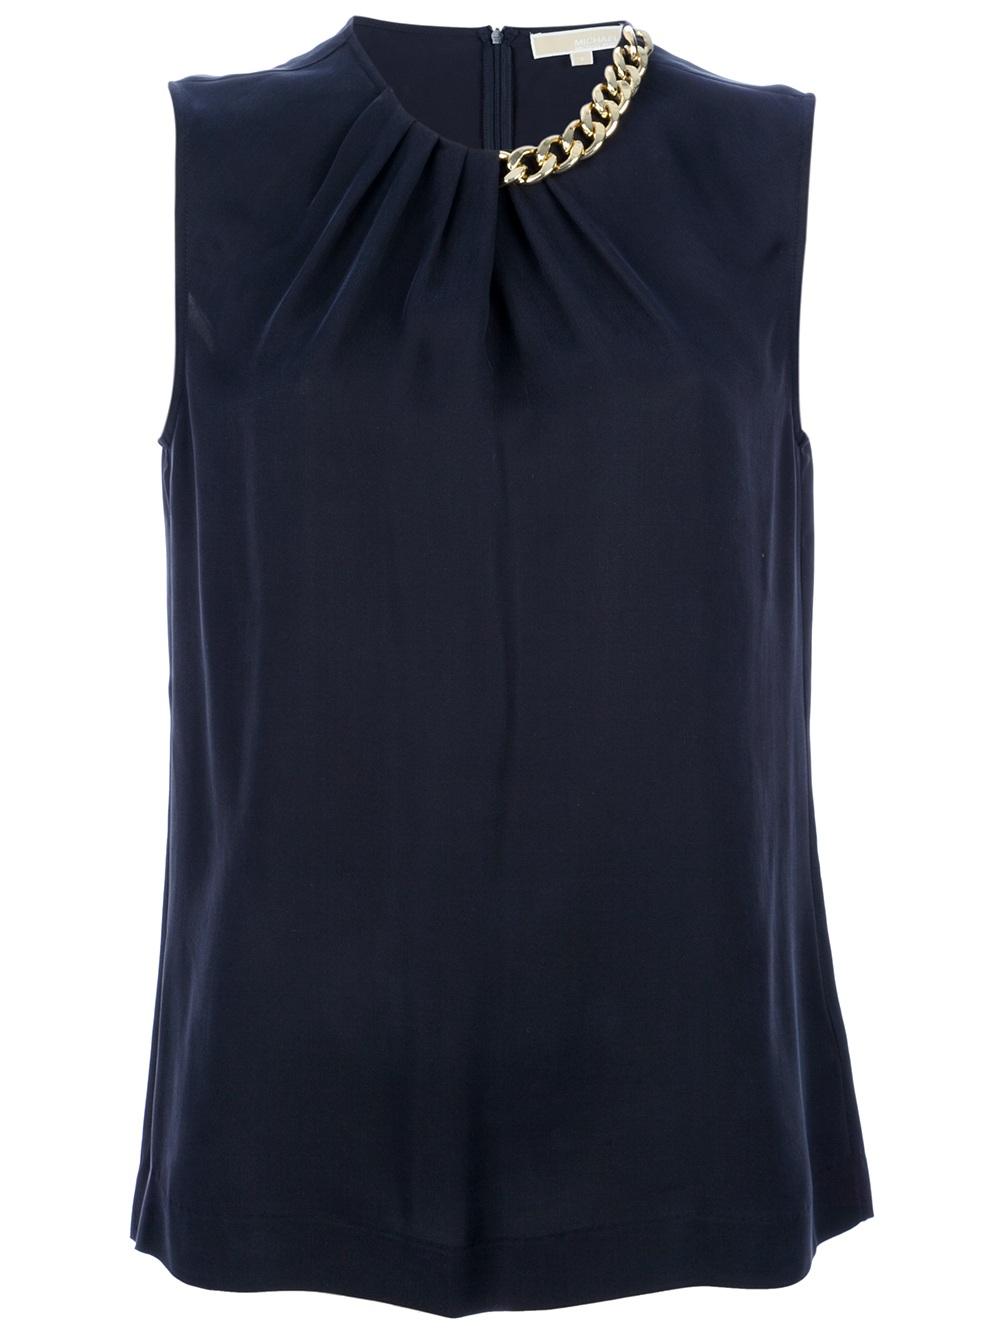 michael kors chain detail silk blouse in blue navy lyst. Black Bedroom Furniture Sets. Home Design Ideas